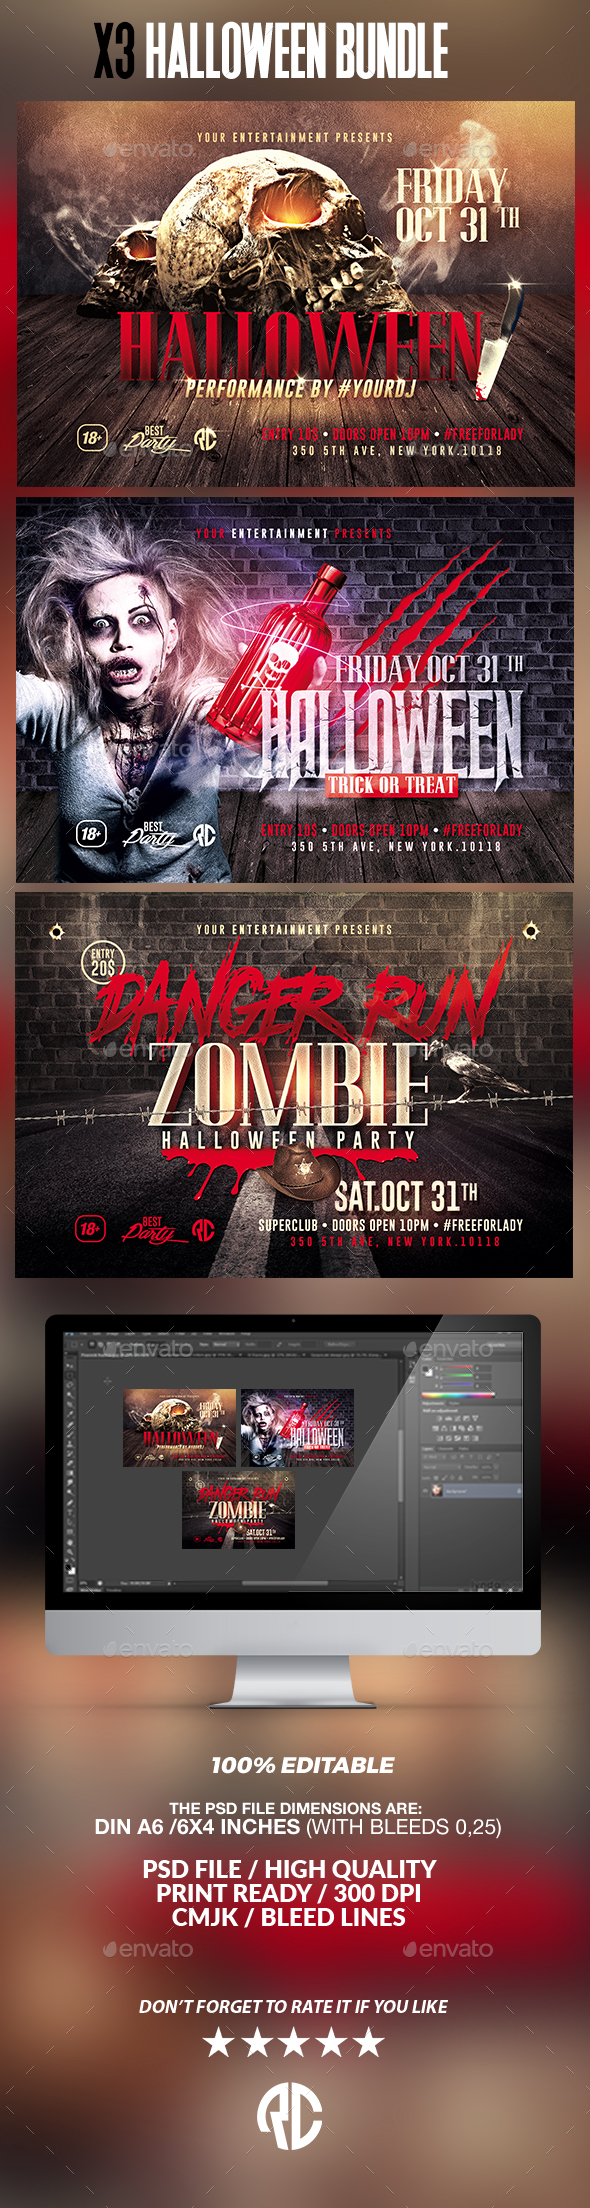 Halloween Bundle | x3 Flyer Templates